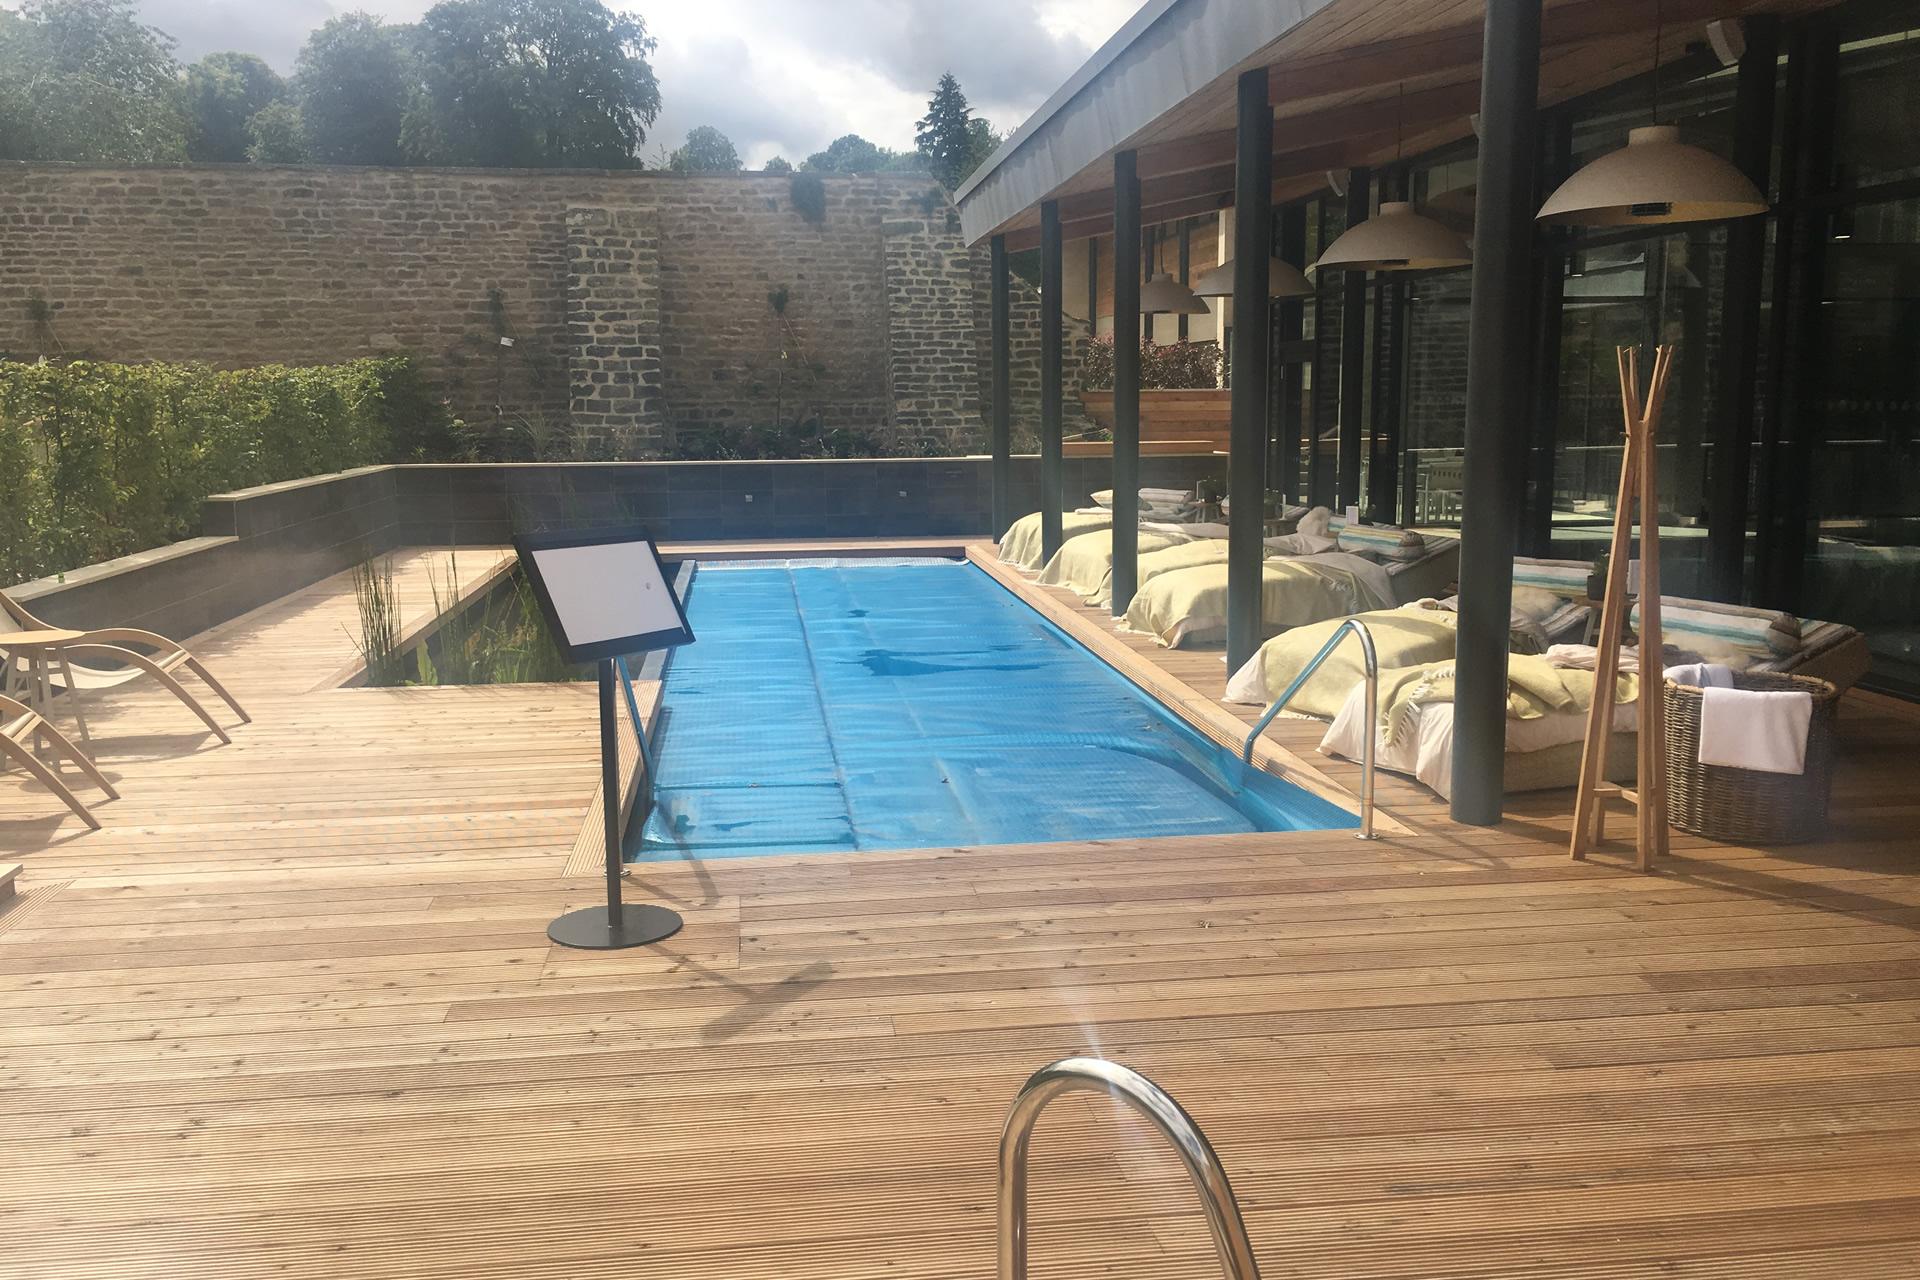 swinton park outside pool